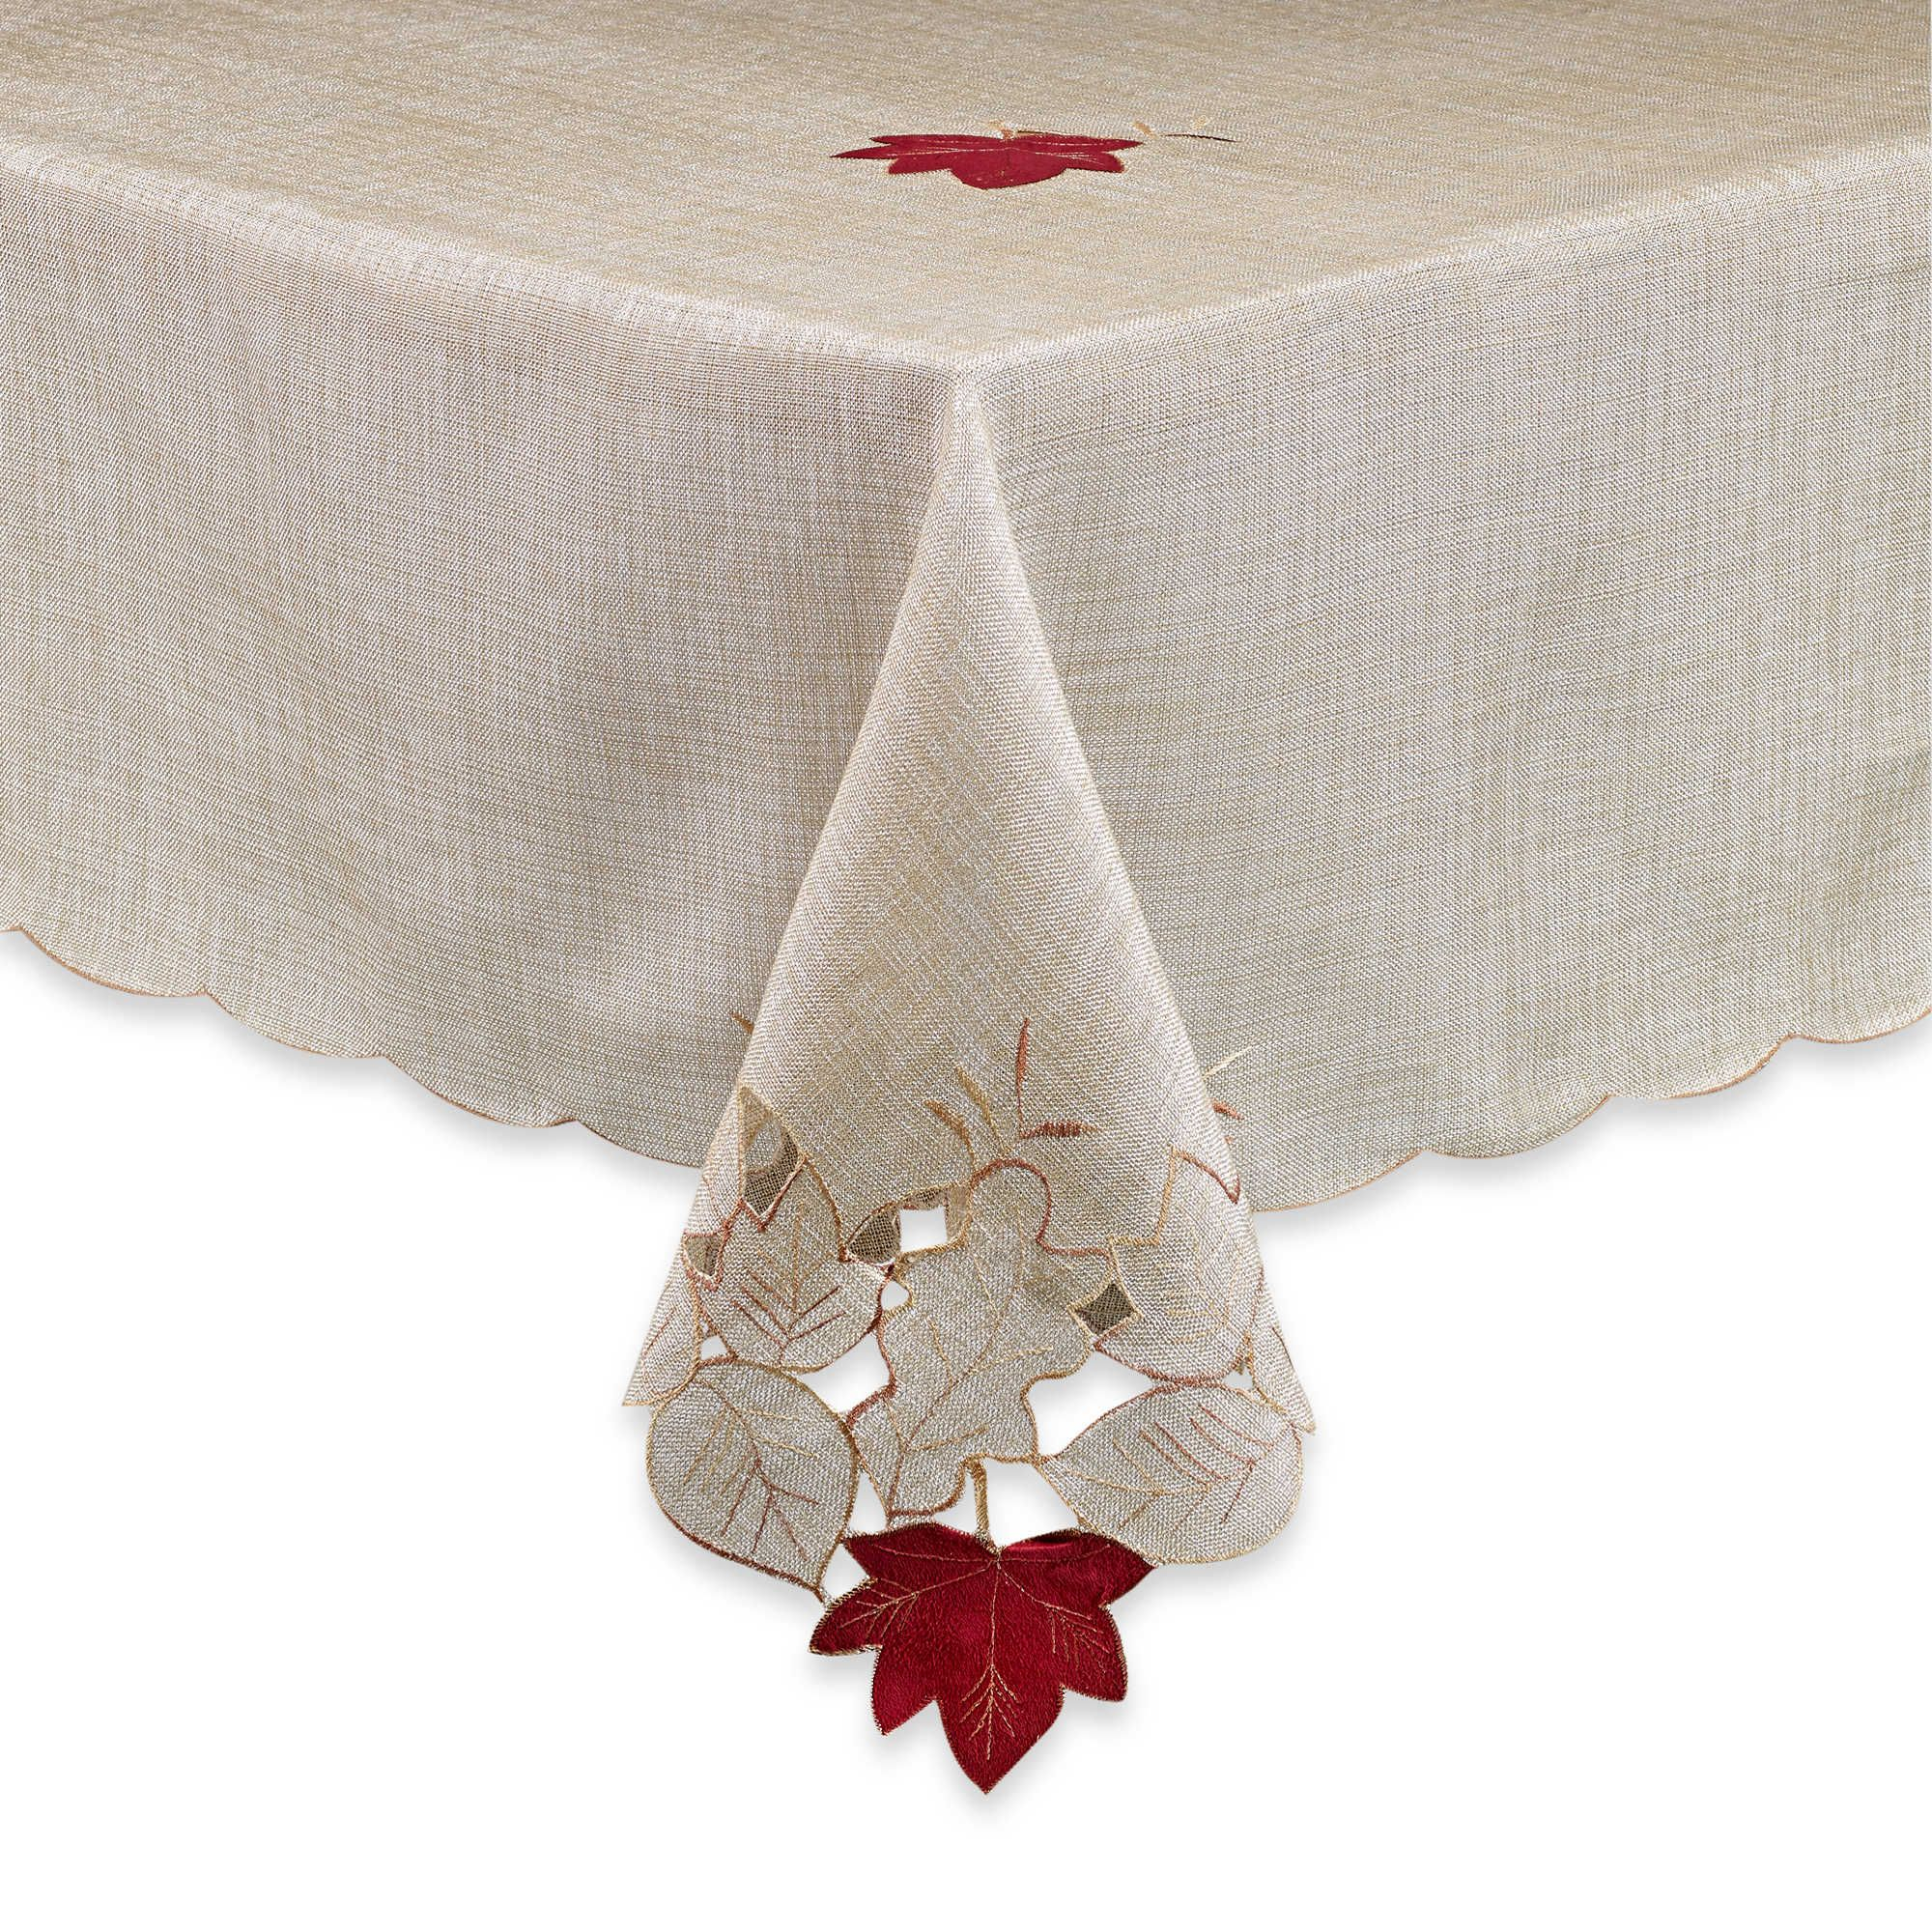 Stylish Thanksgiving Tablecloths Elegant Tablecloths For Thanksgiving